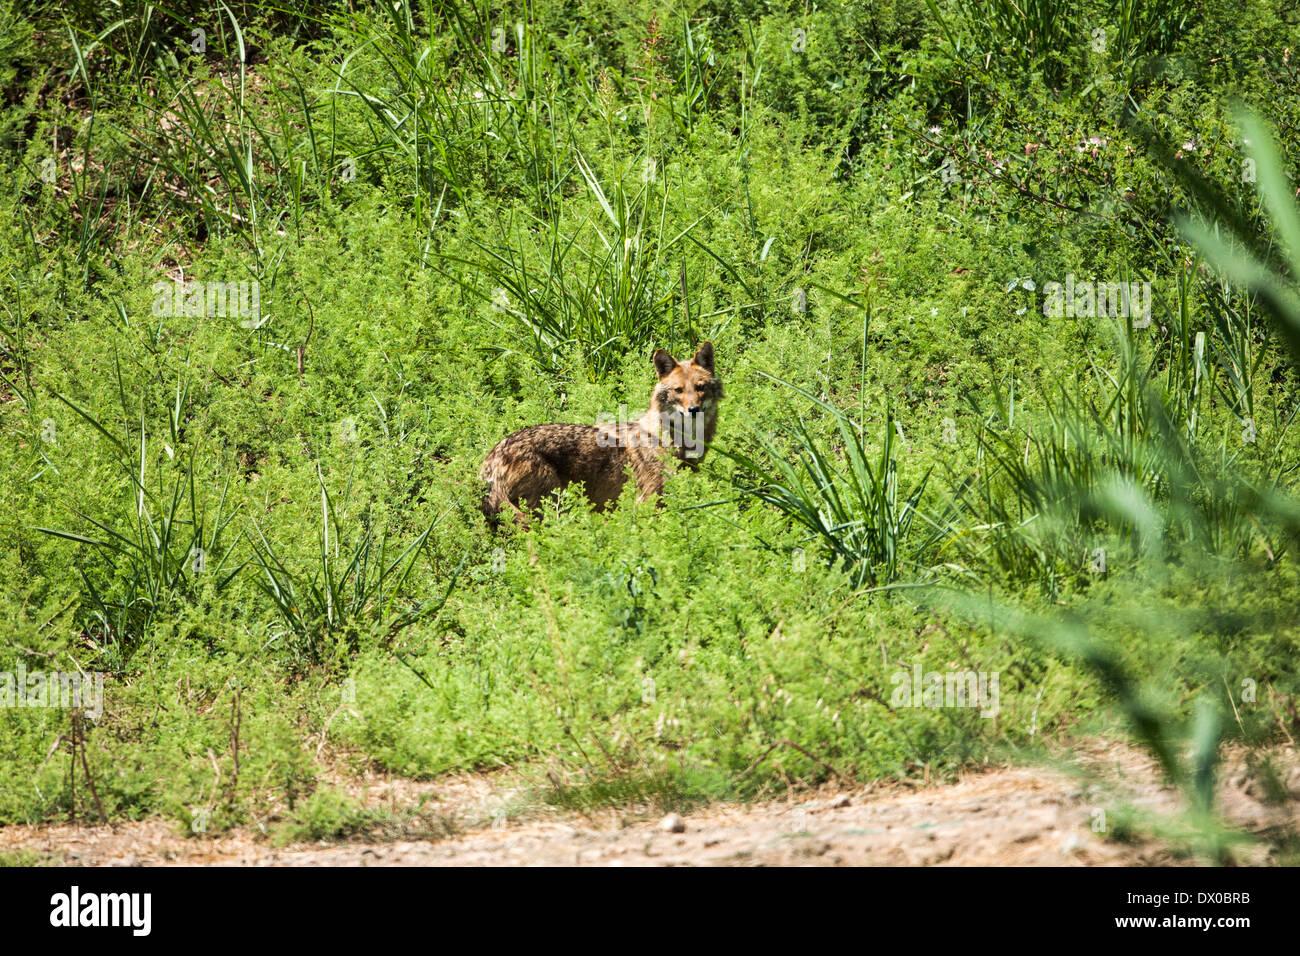 Goldschakal (Canis Aureus), auch genannt asiatisch, orientalisch oder gemeinsame Schakal, Bilder aus dem Monat im Hula-Tal, Israel Stockbild